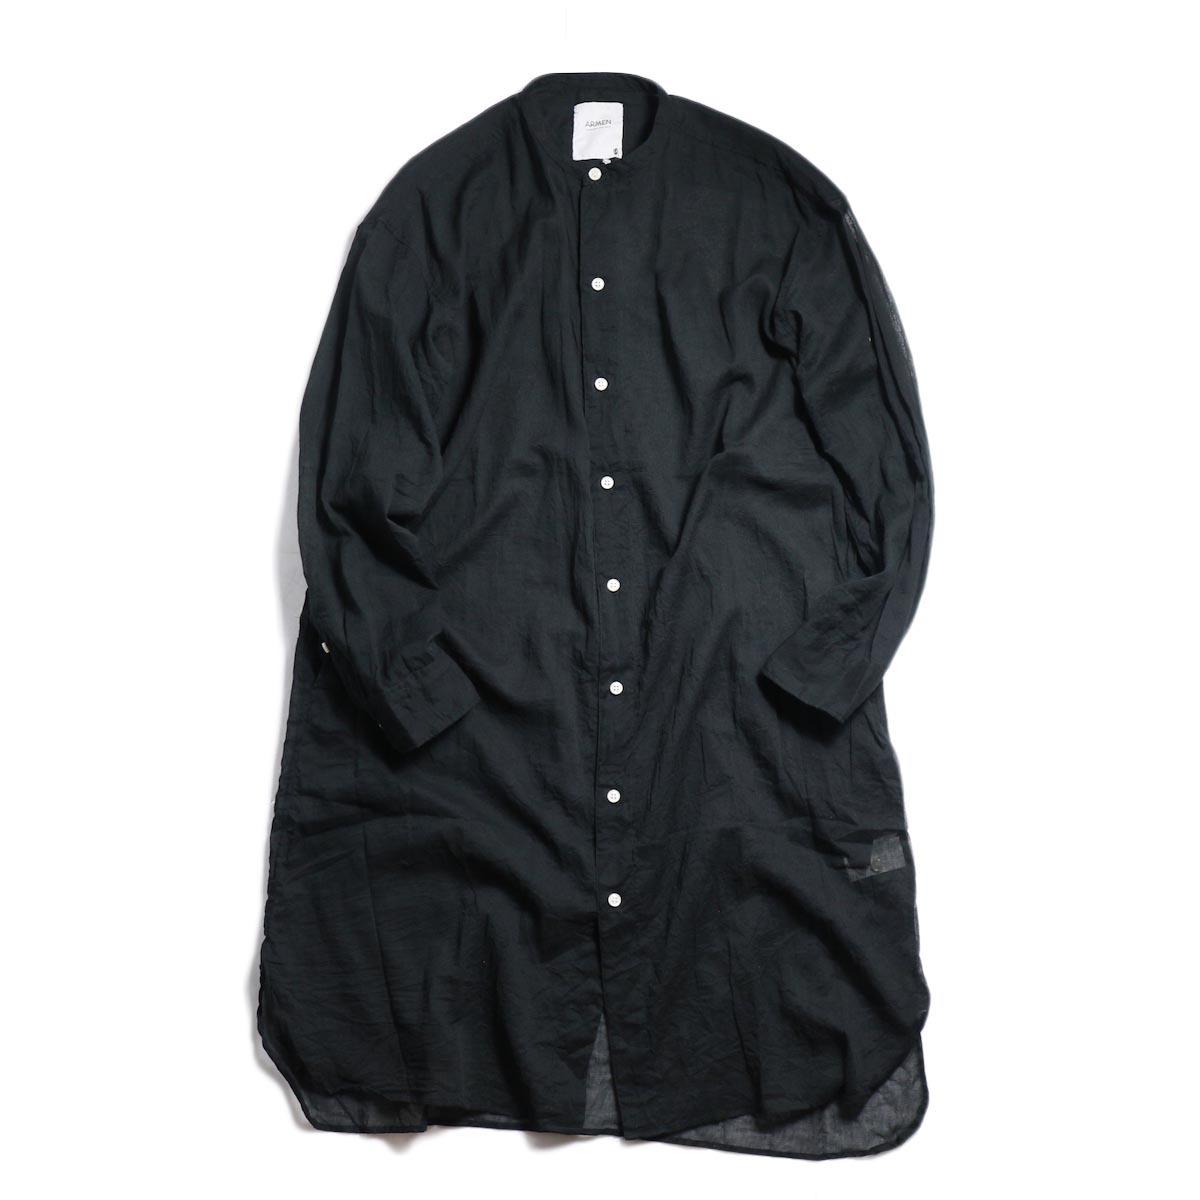 ARMEN / Utility Banded Collar Long Shirt -Black